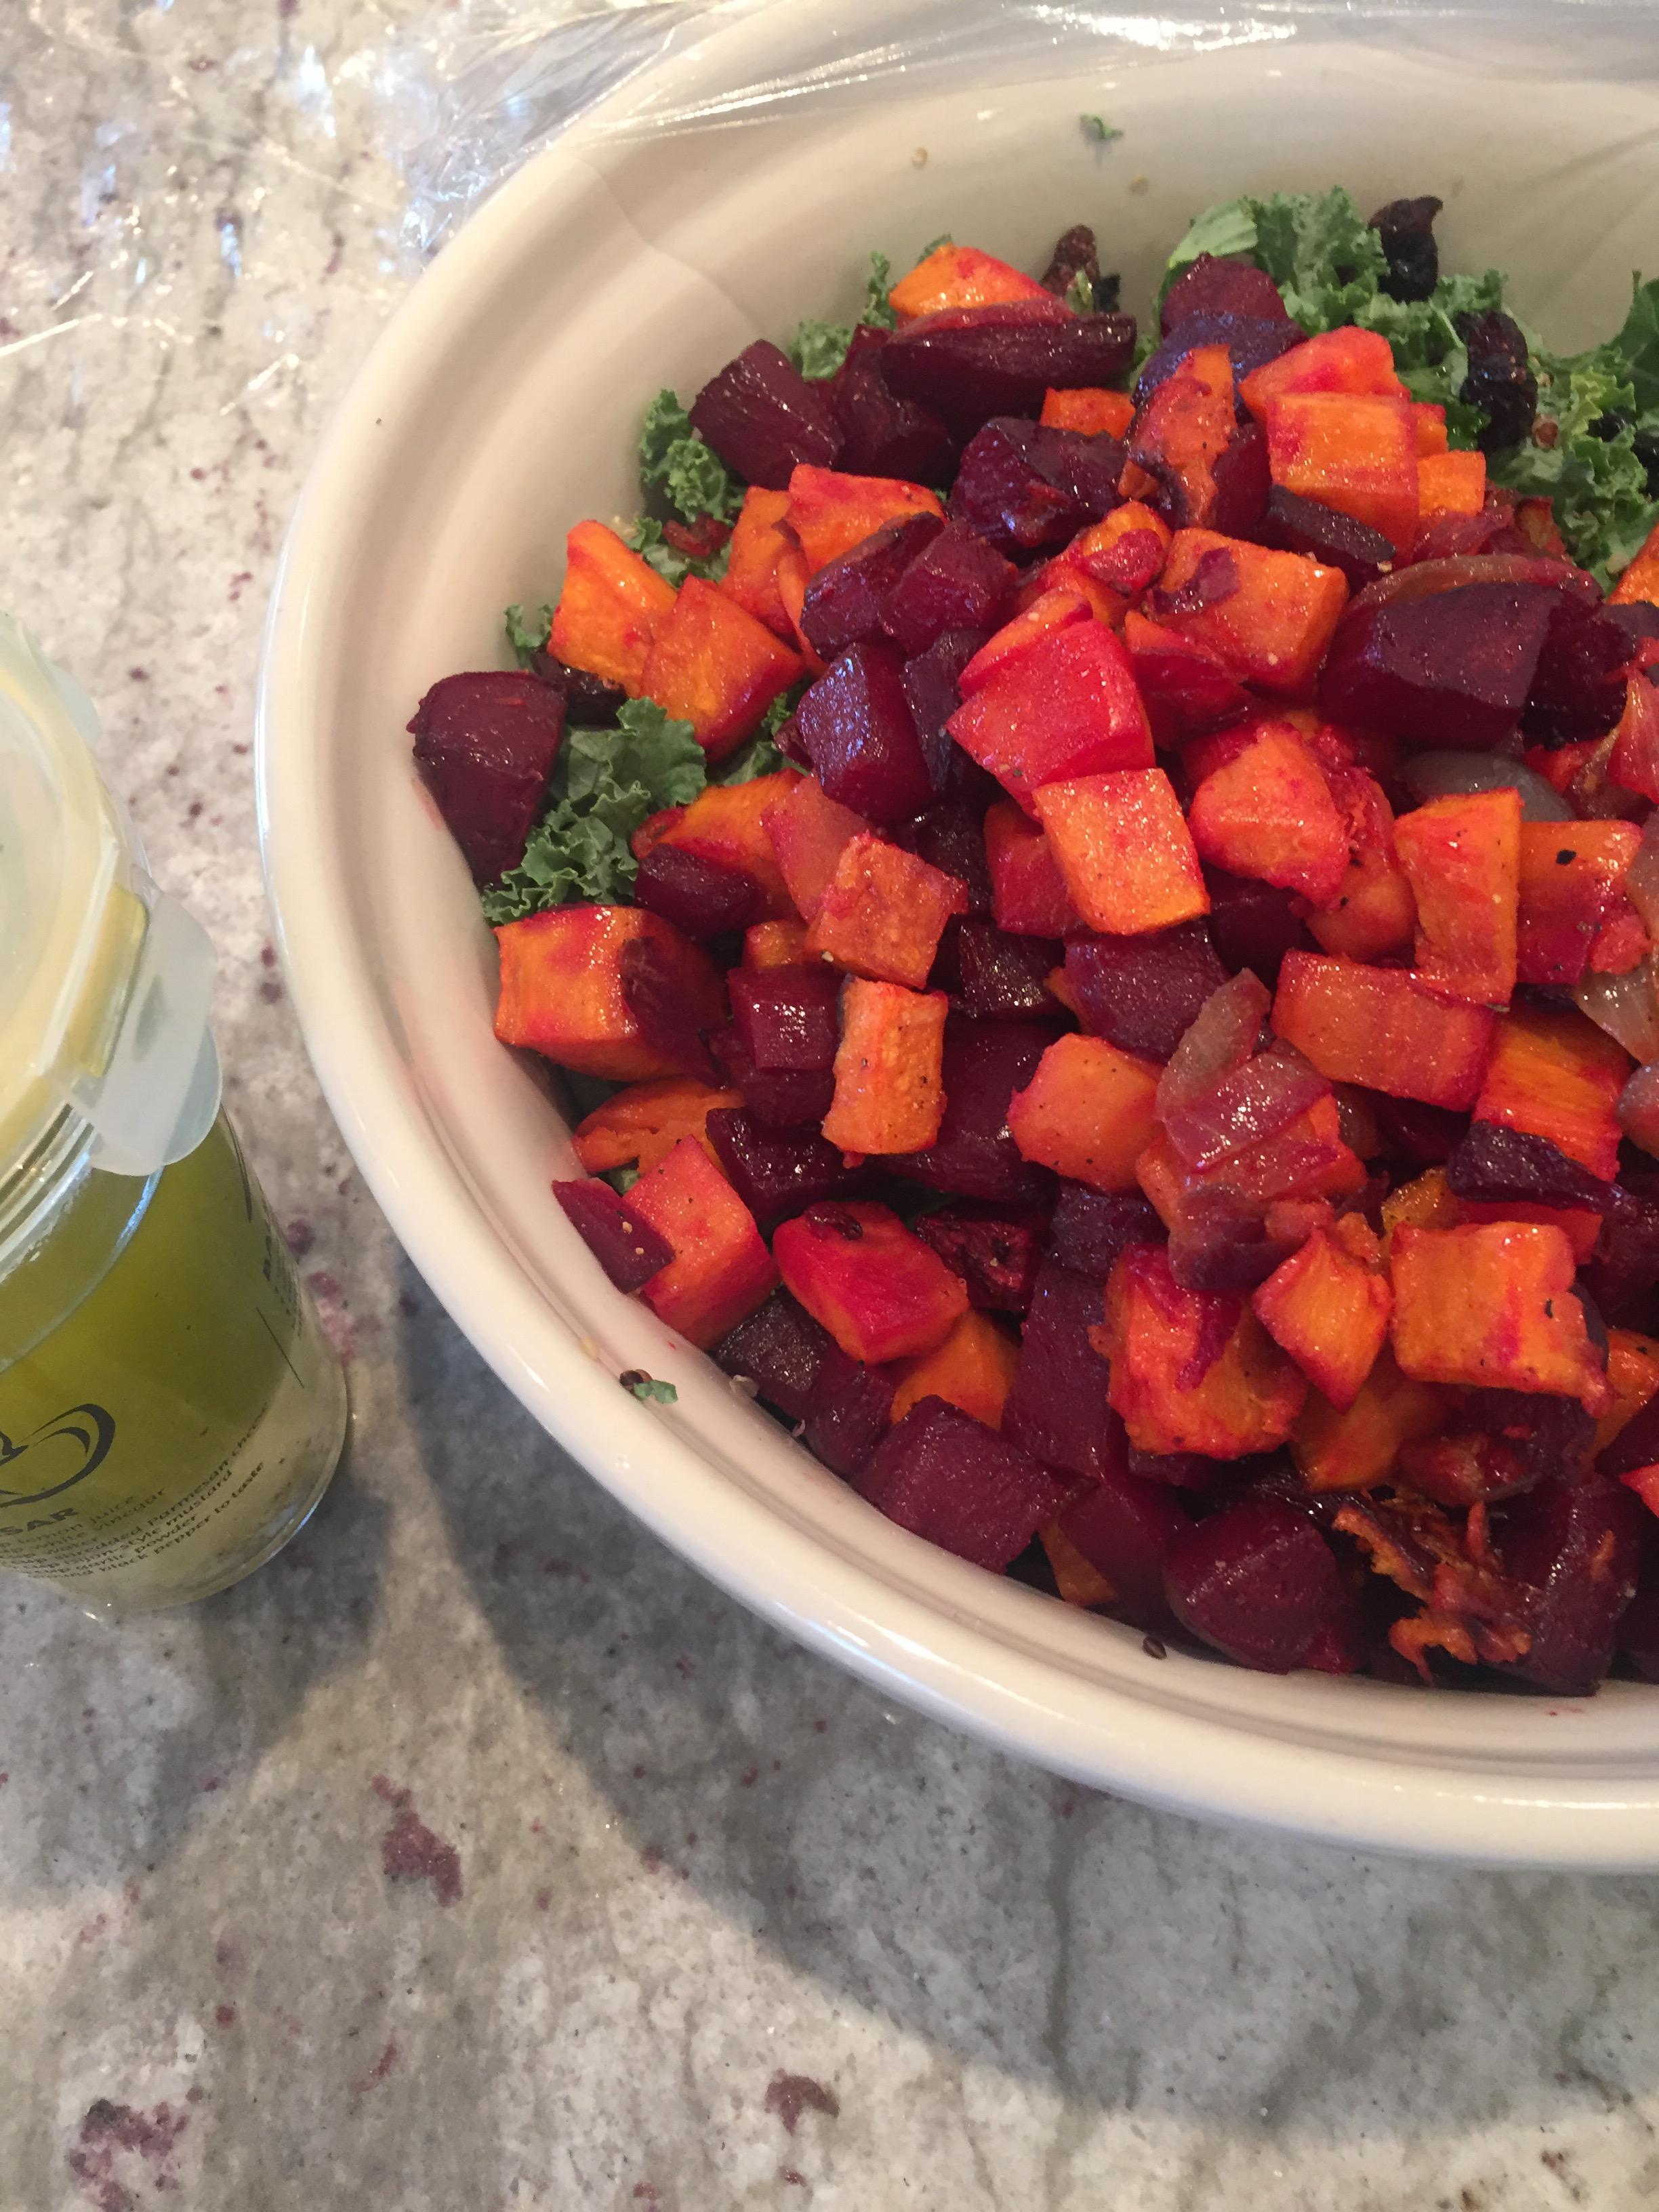 Kale salad dressing recipe